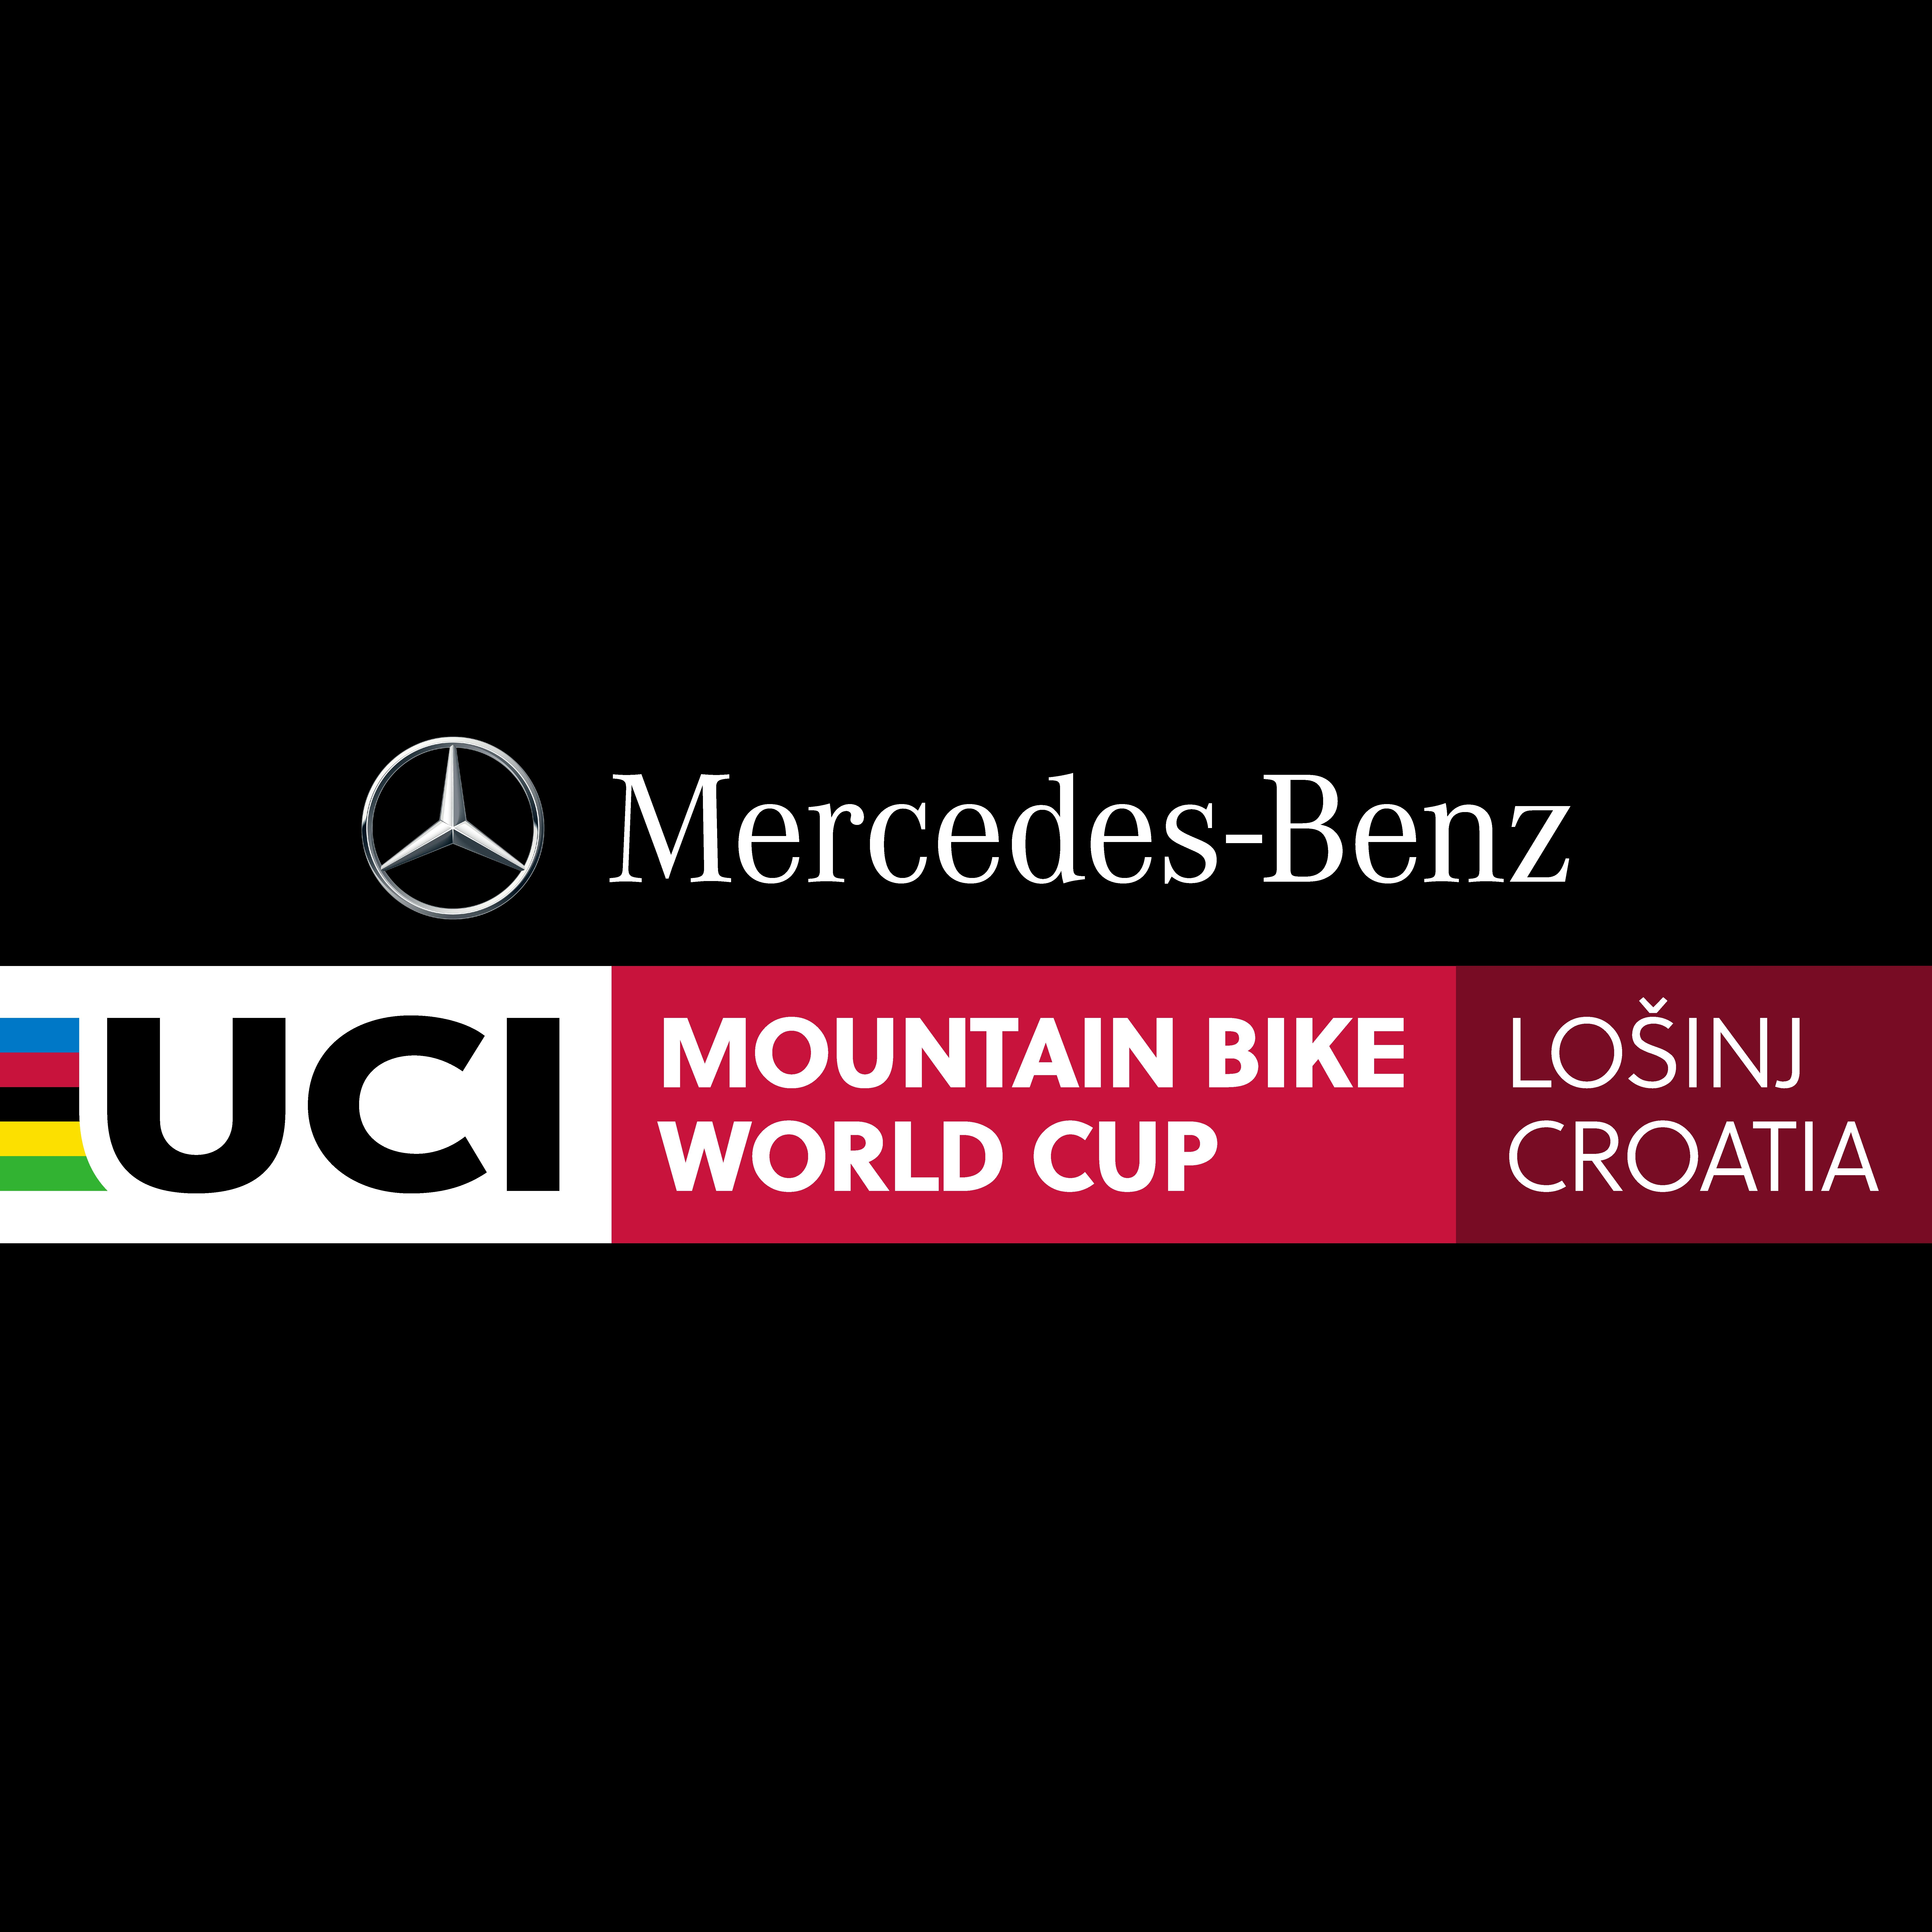 2018 UCI Mountain Bike World Cup